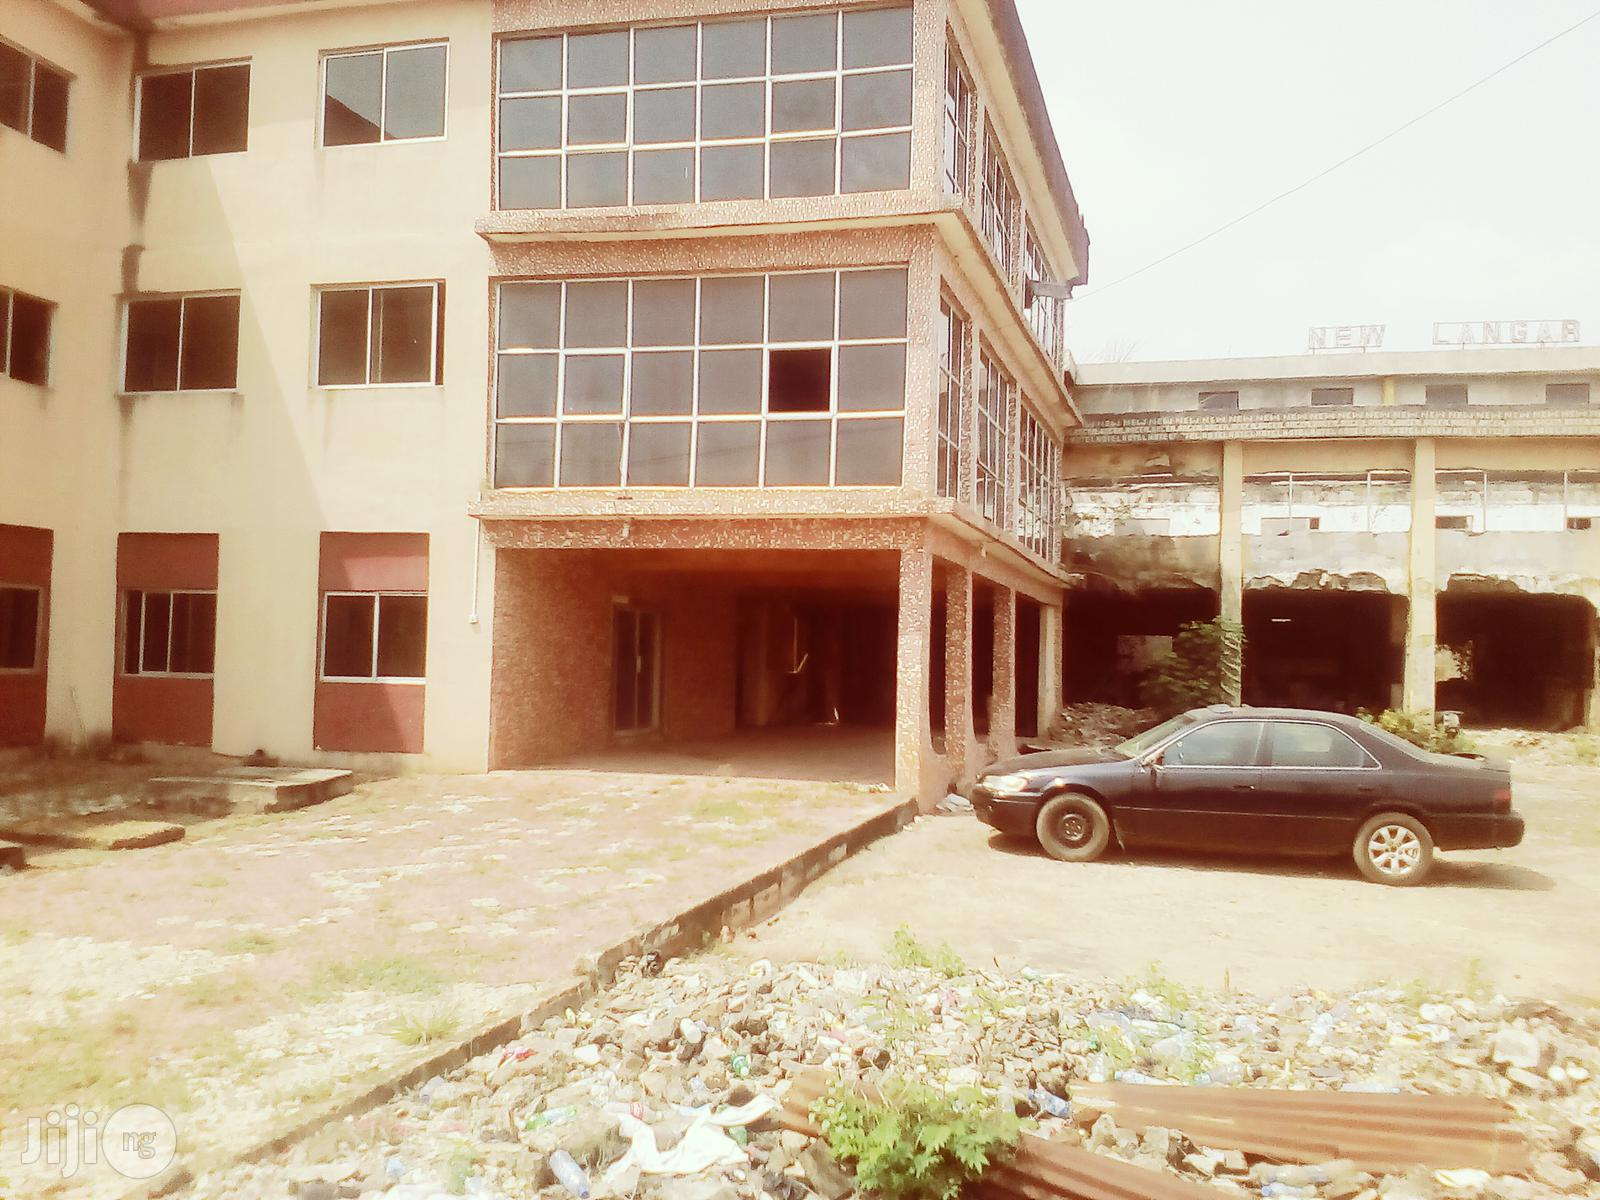 Hotel/Event Centre For Sale At GRA Benin City | Commercial Property For Sale for sale in Benin City, Edo State, Nigeria